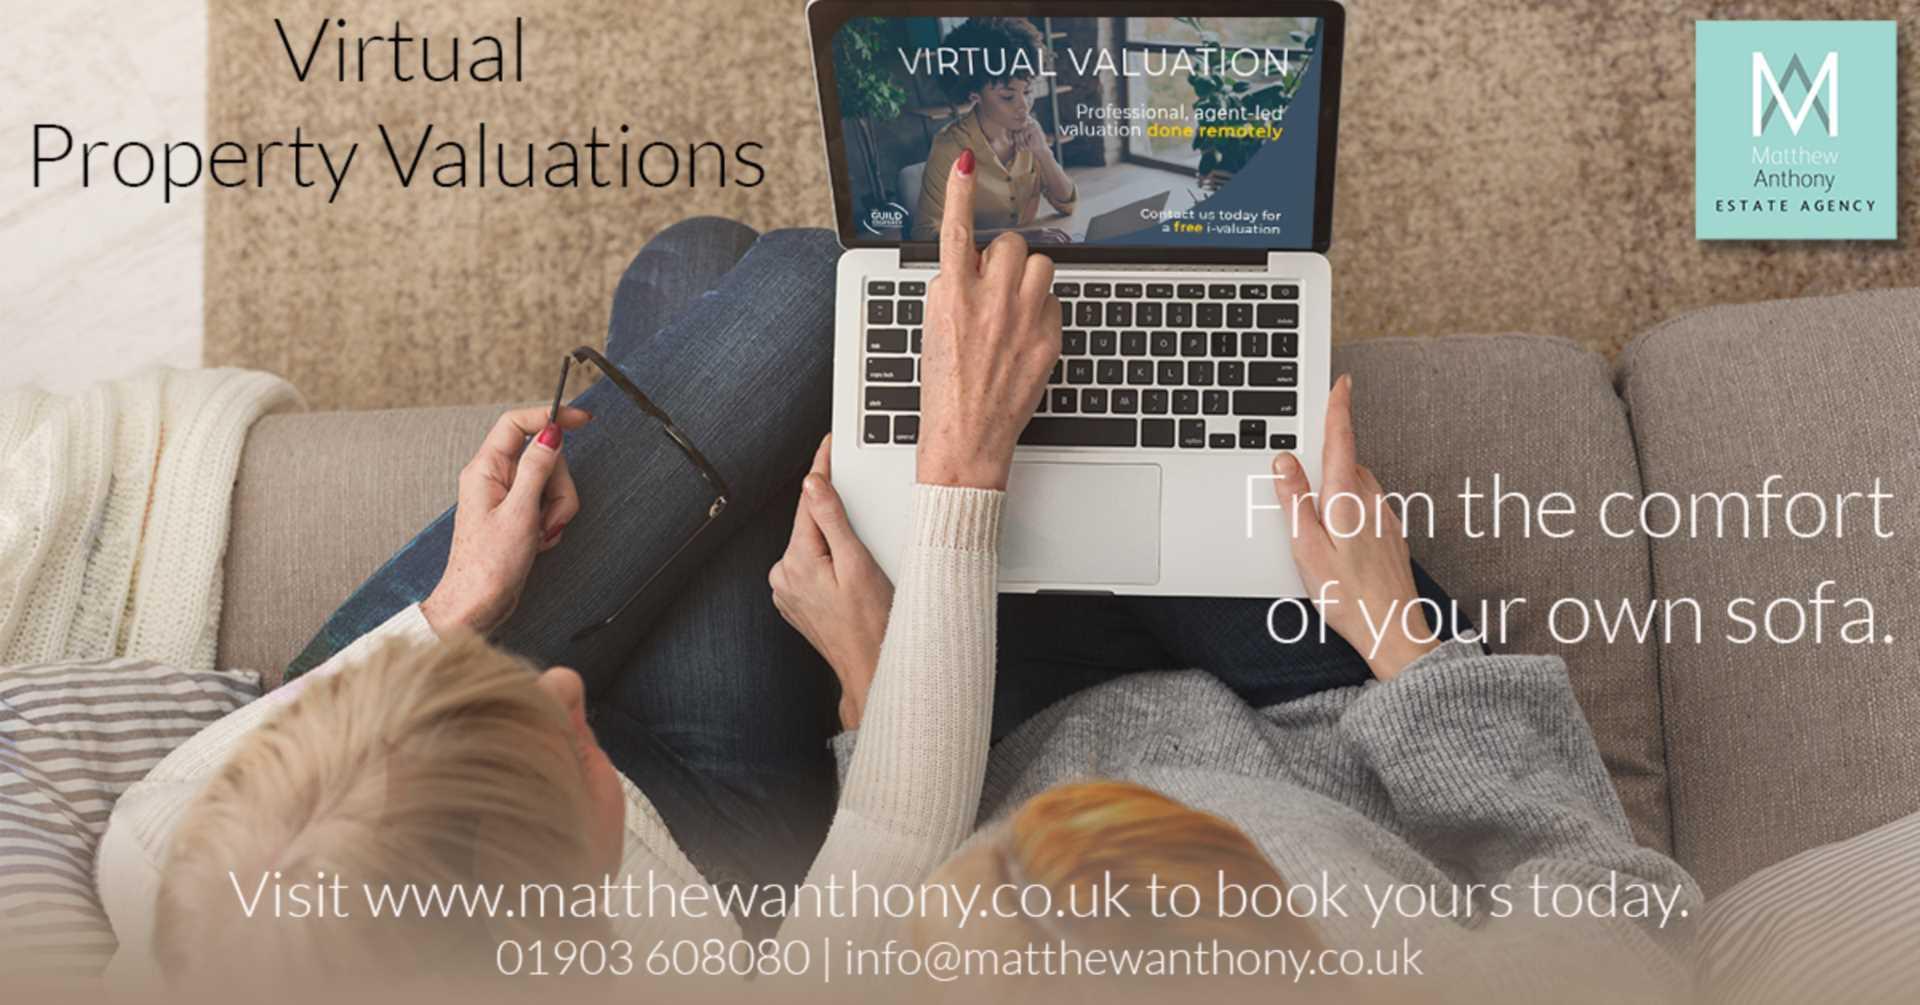 Virtual Valuations